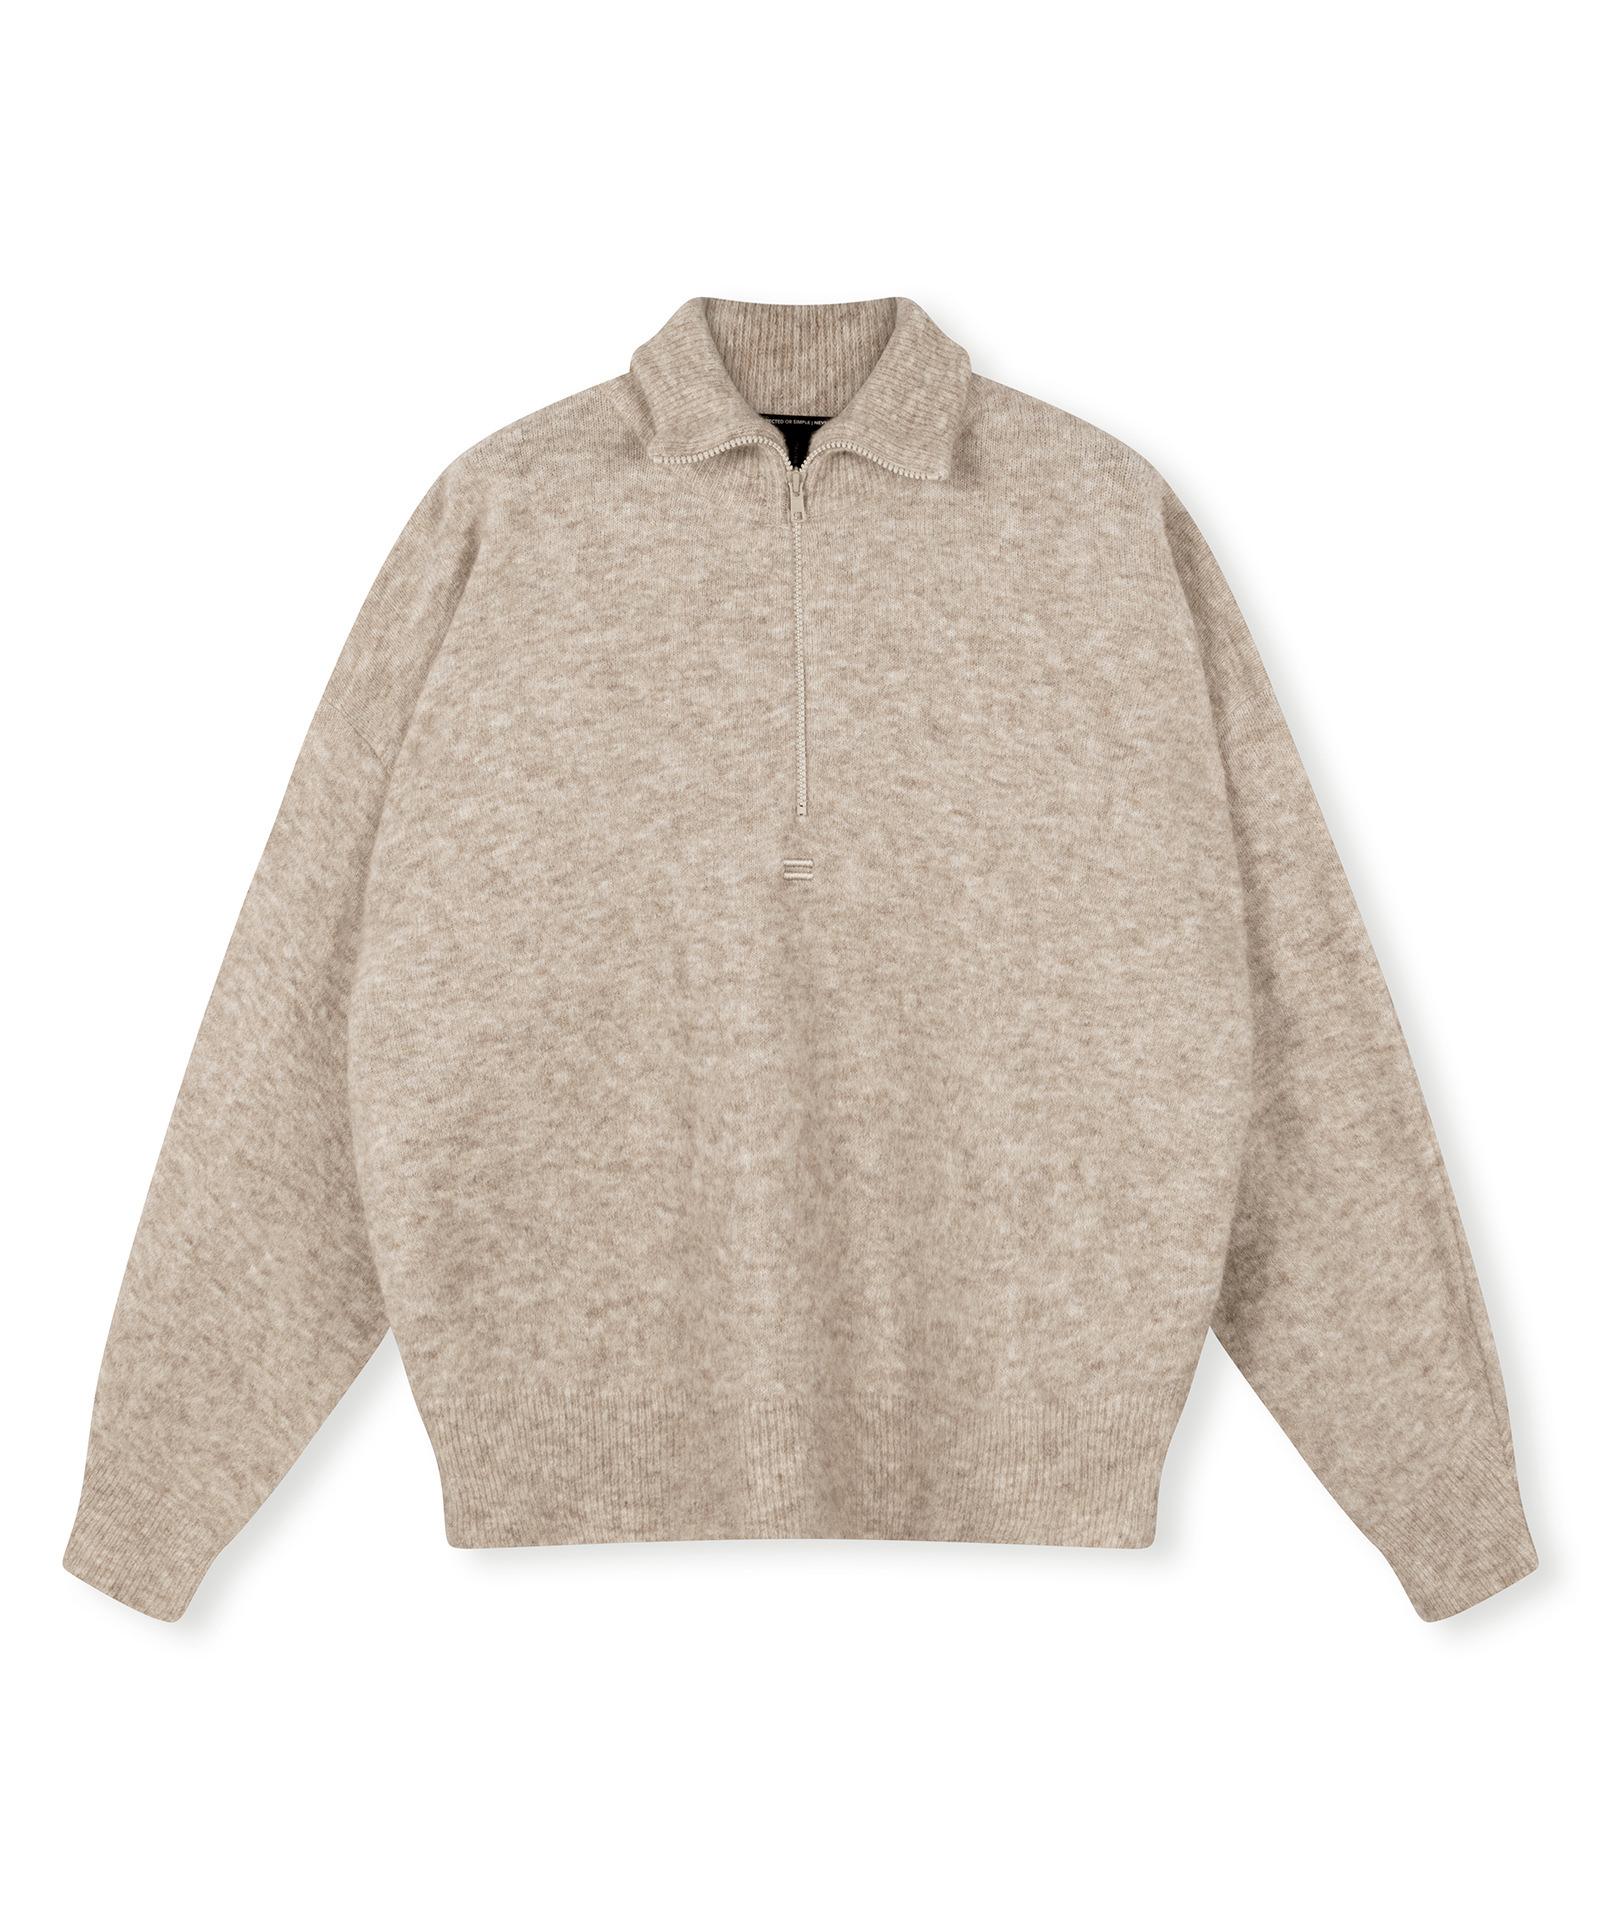 High Neck Sweater - Cement